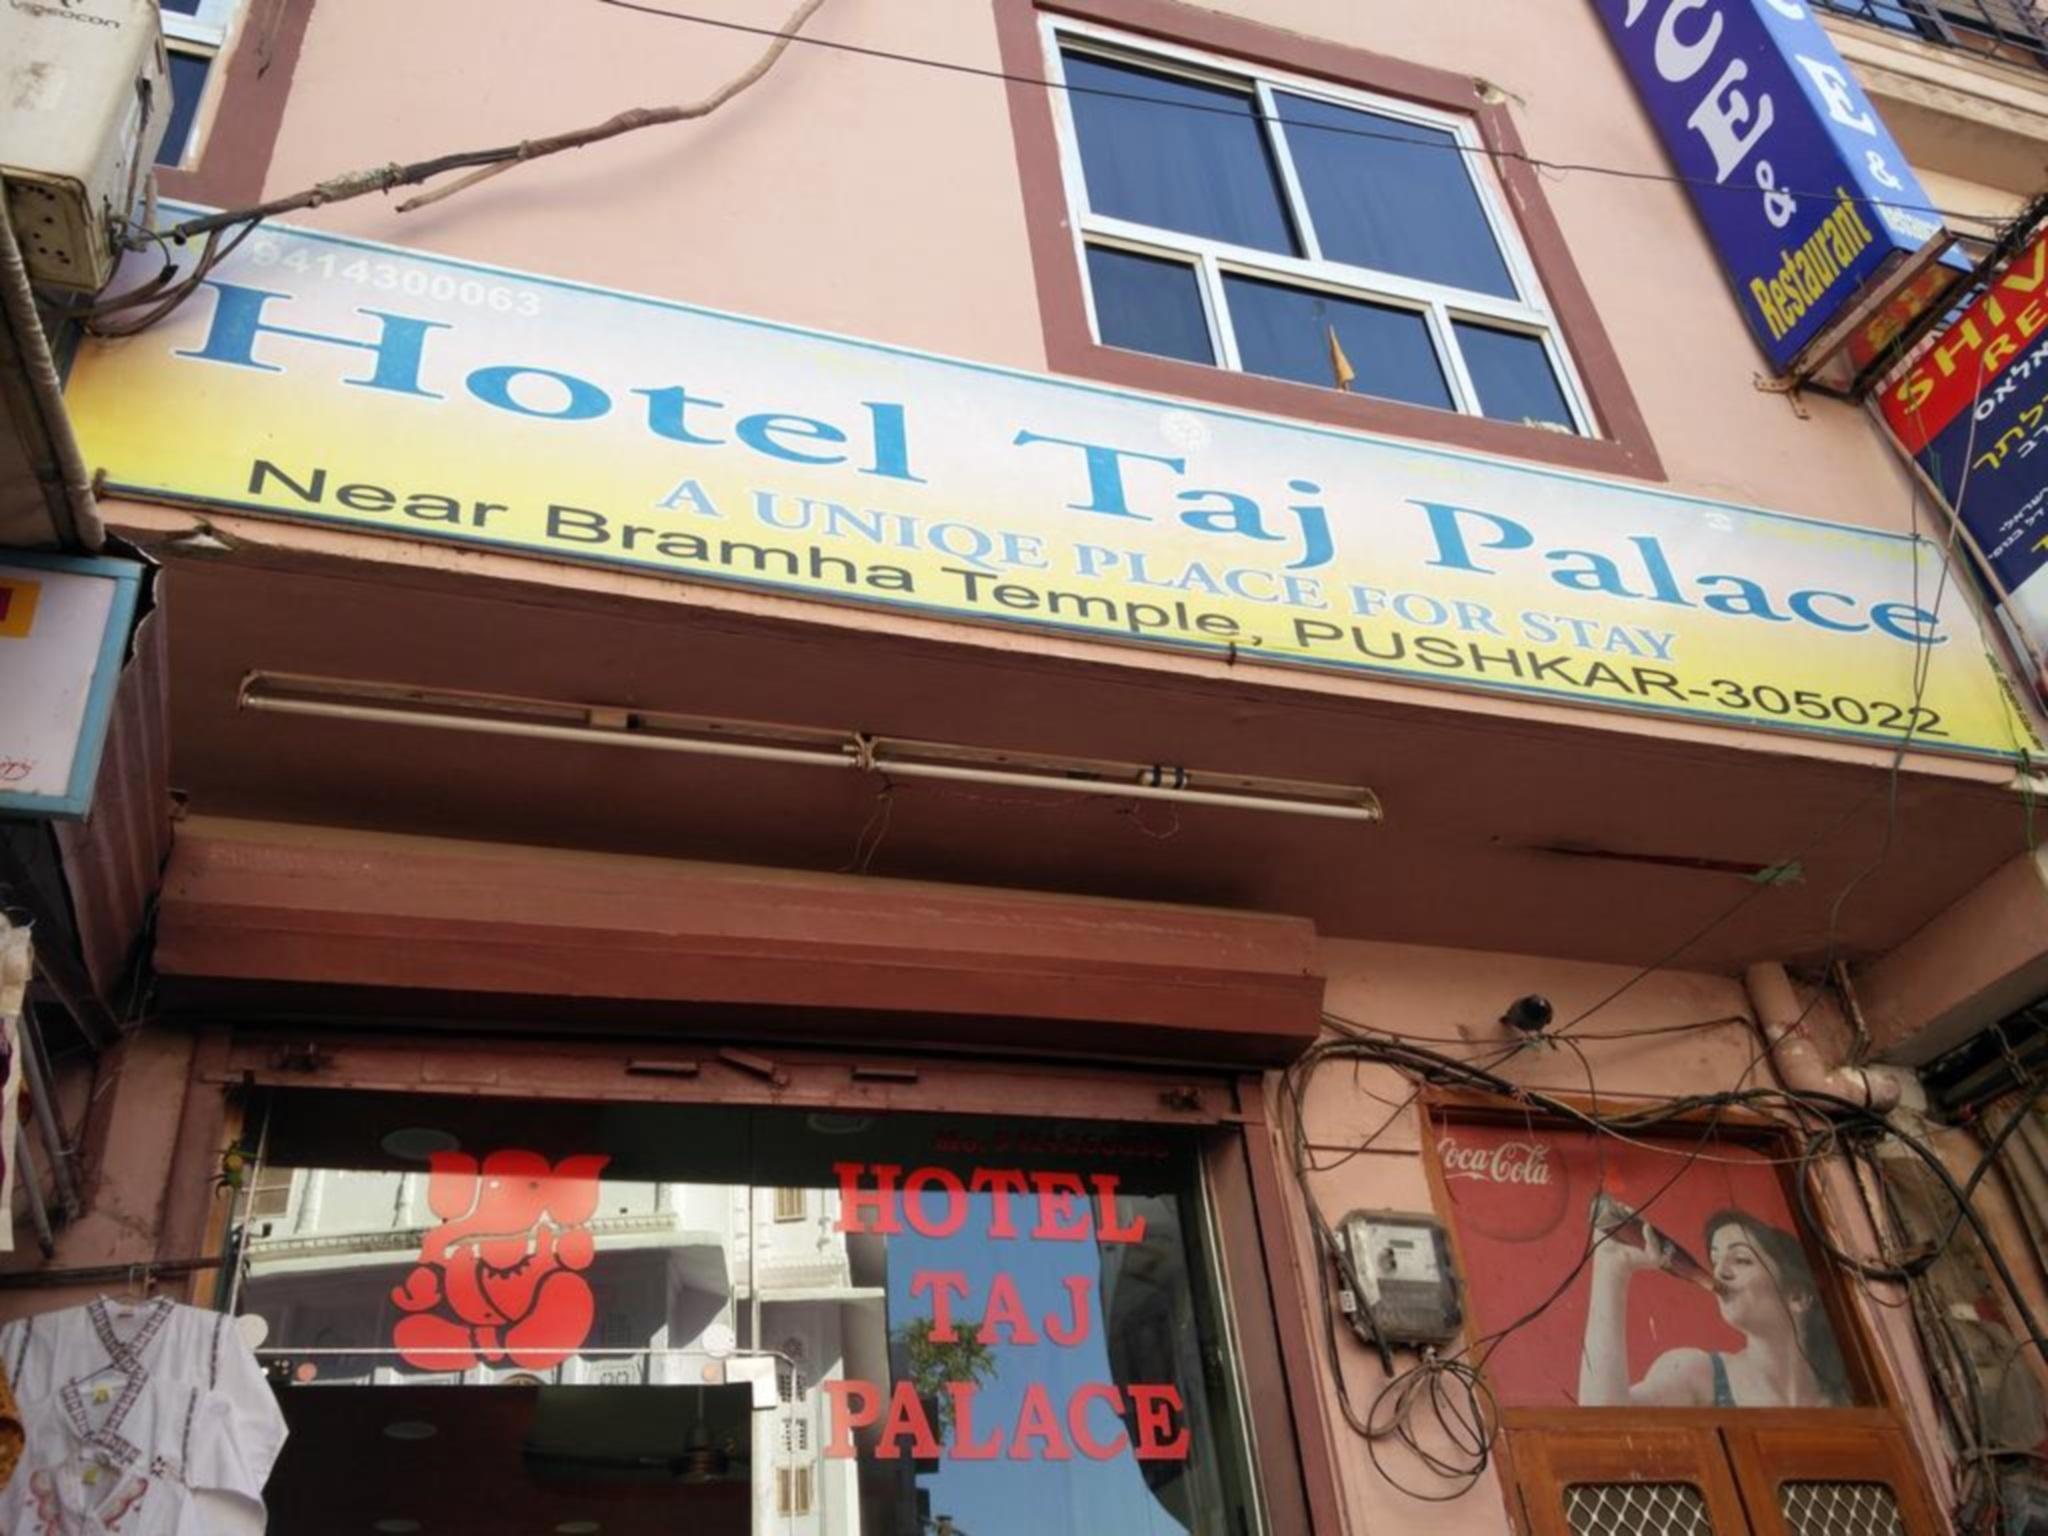 Hotel Taj Palace, Ajmer